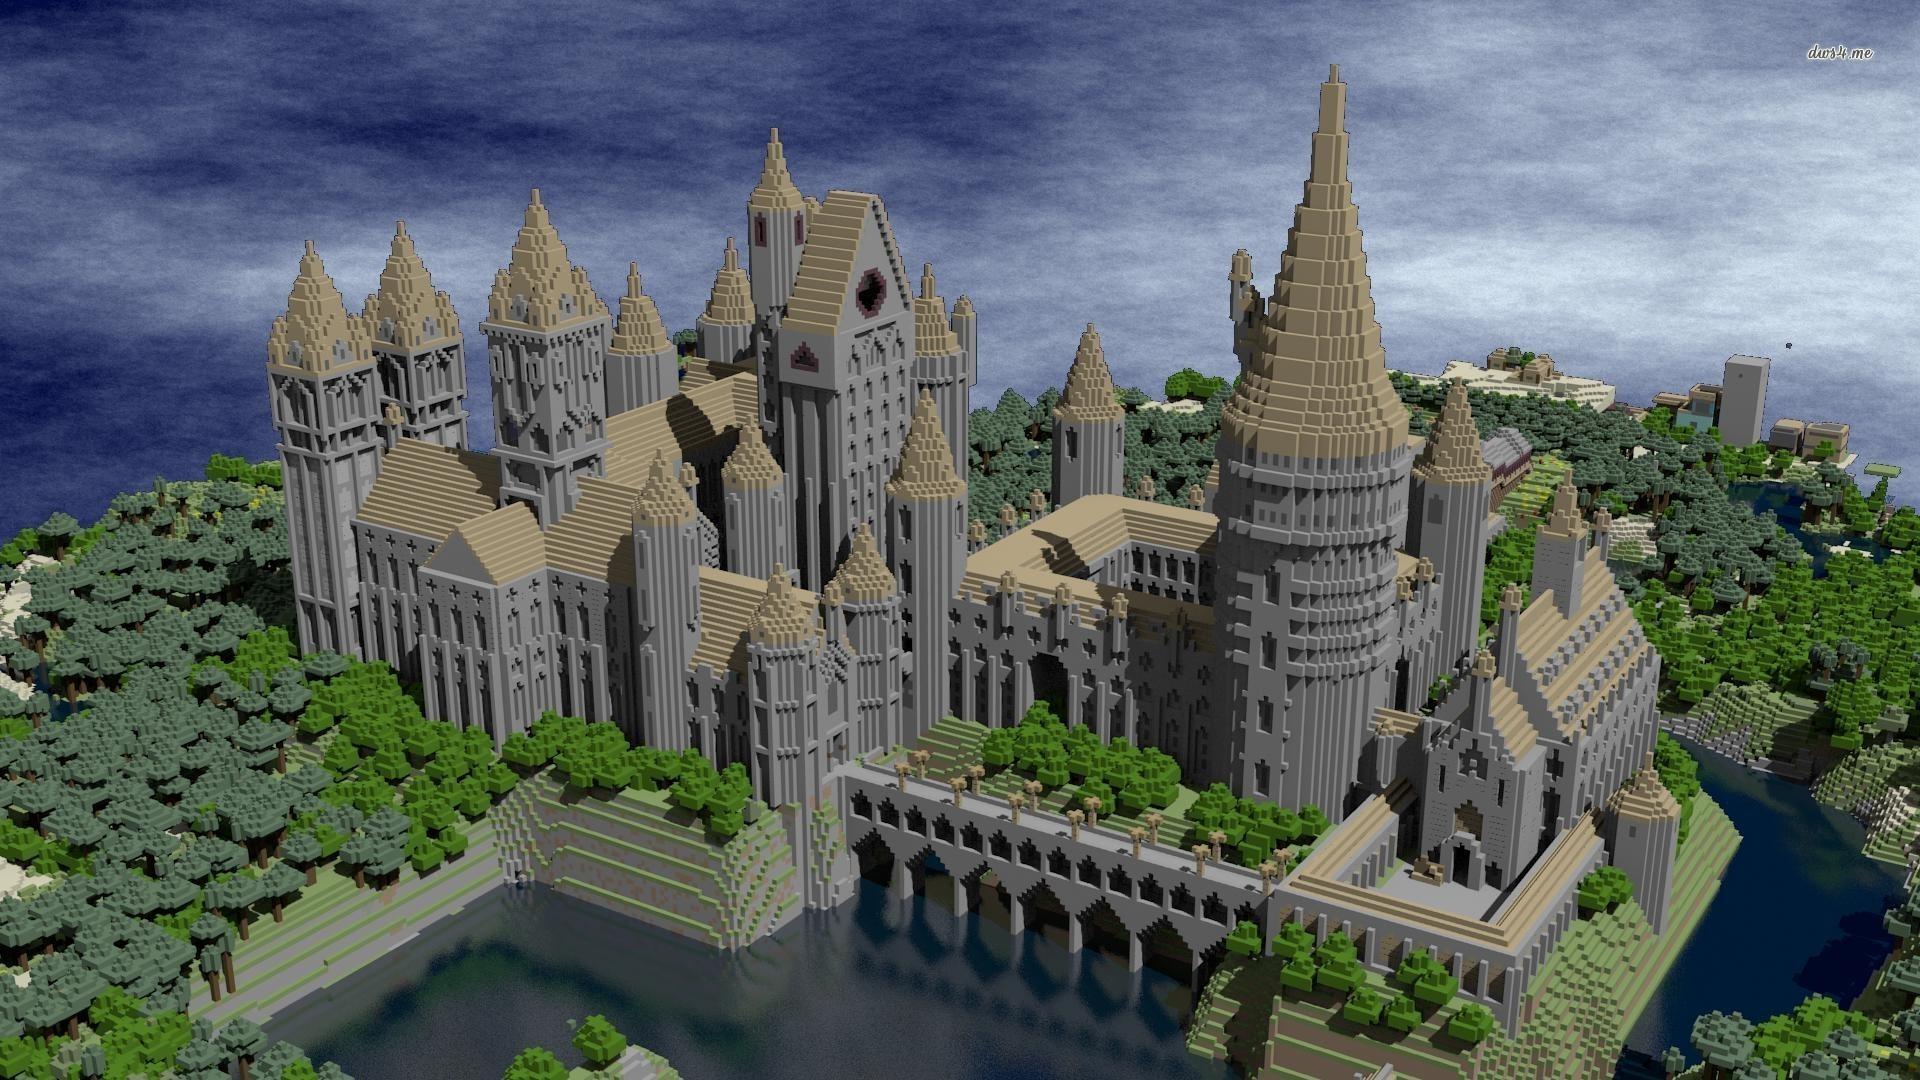 122 Hogwarts Crest